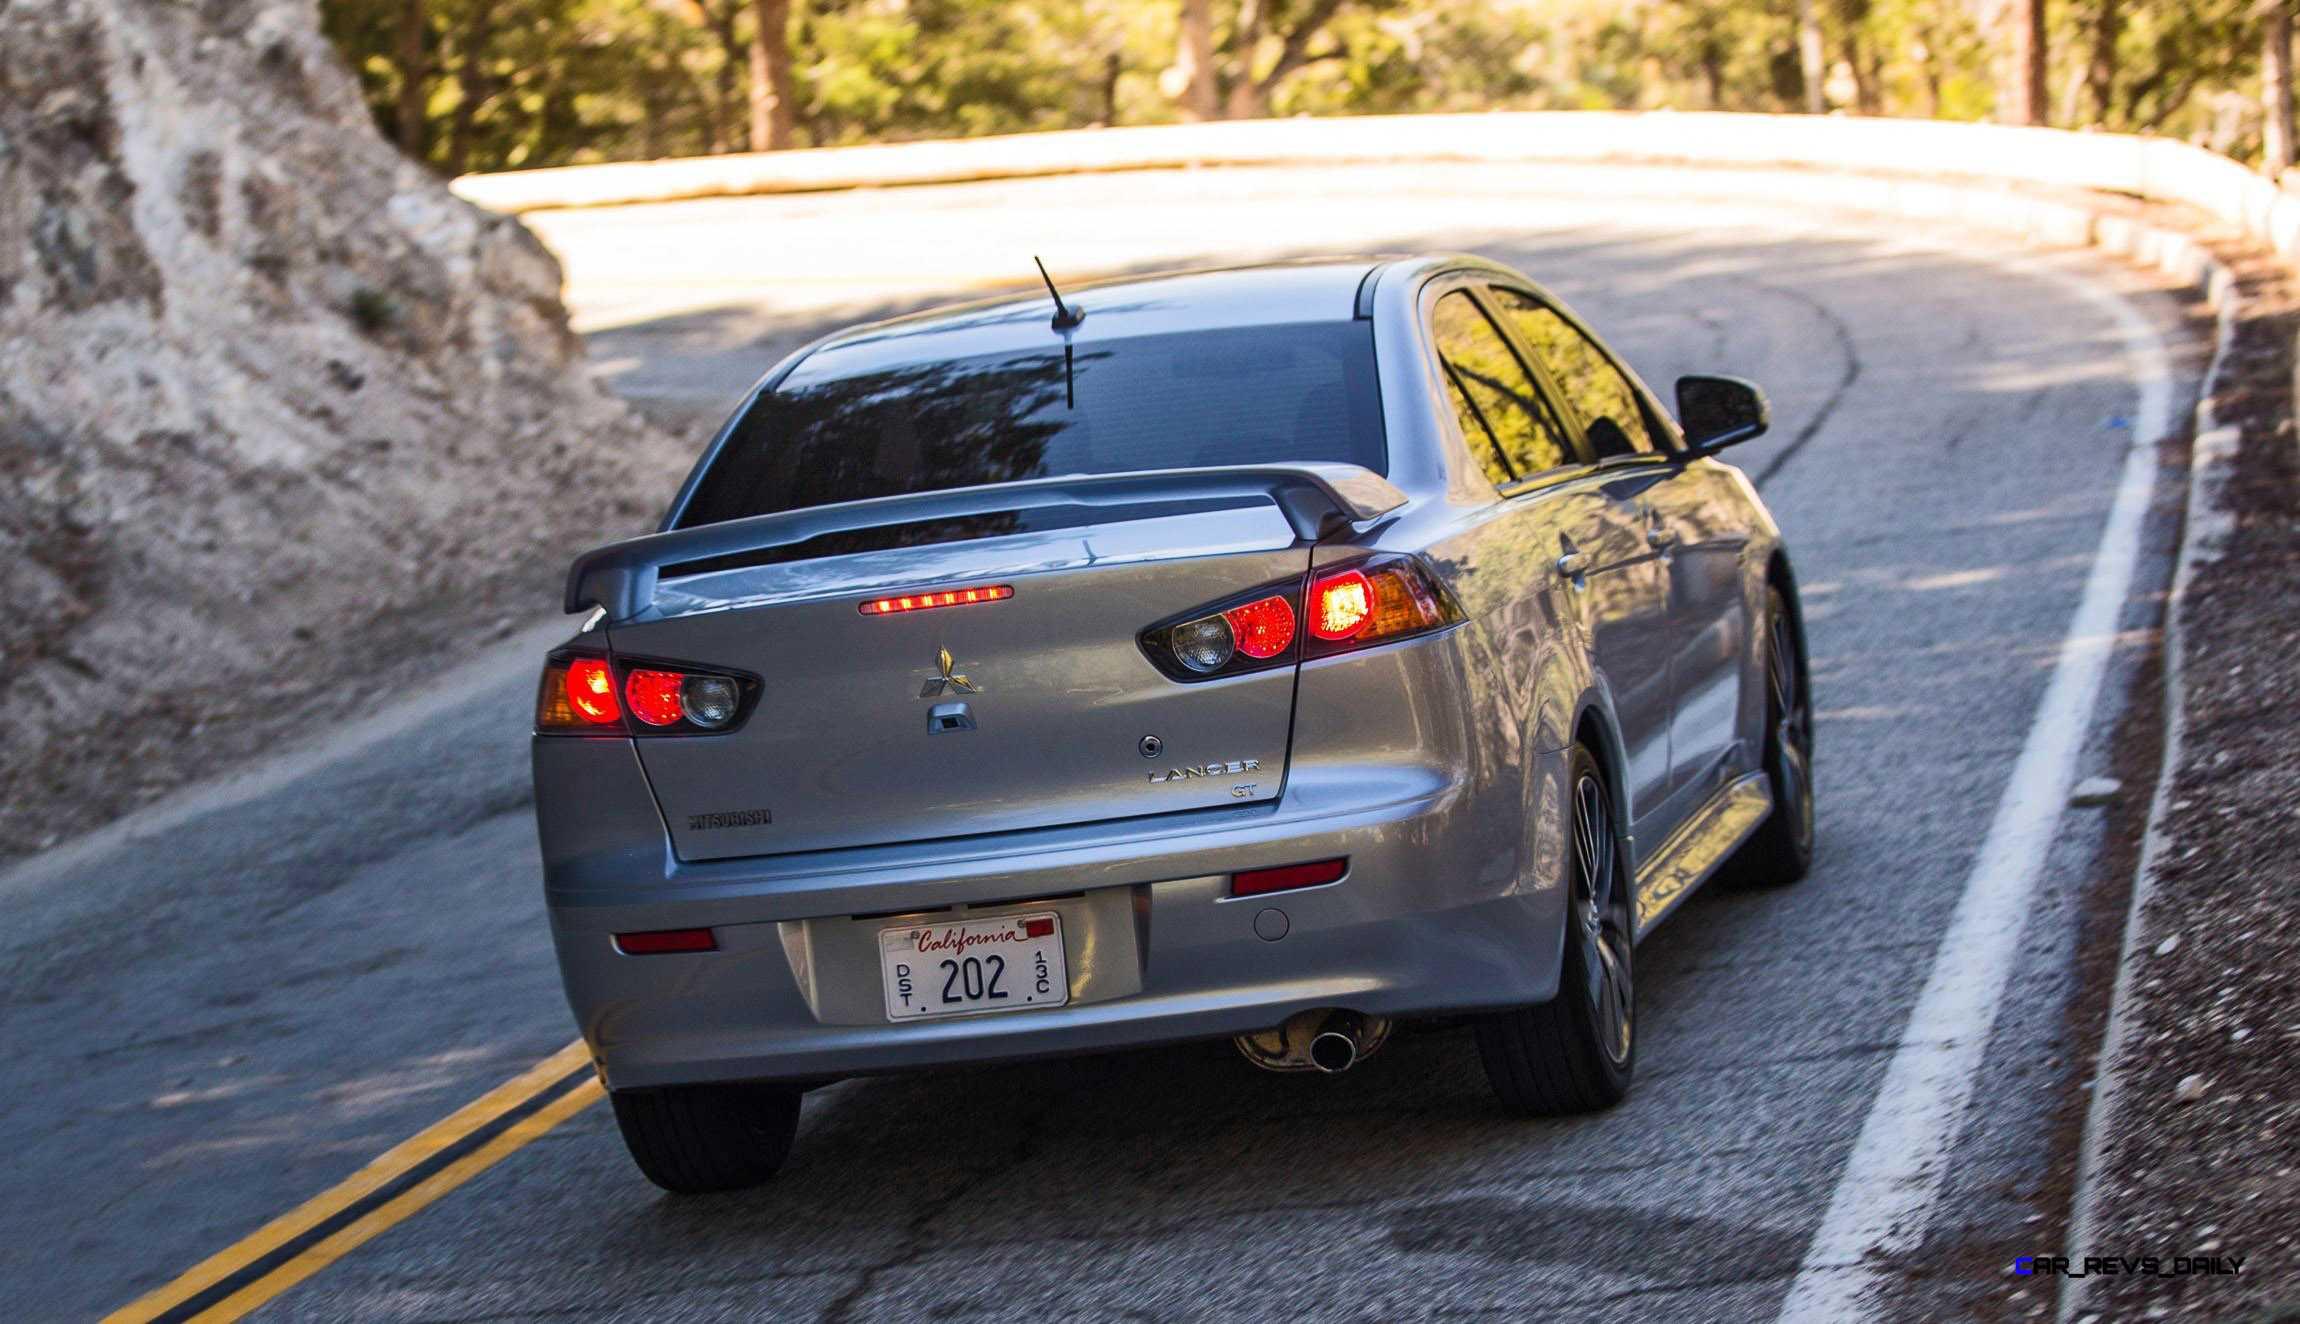 las to team mitsubishi s sema blog vegas custom at lancer james hybrid mcwilliams eric filter x evolution brought air performance features show evo